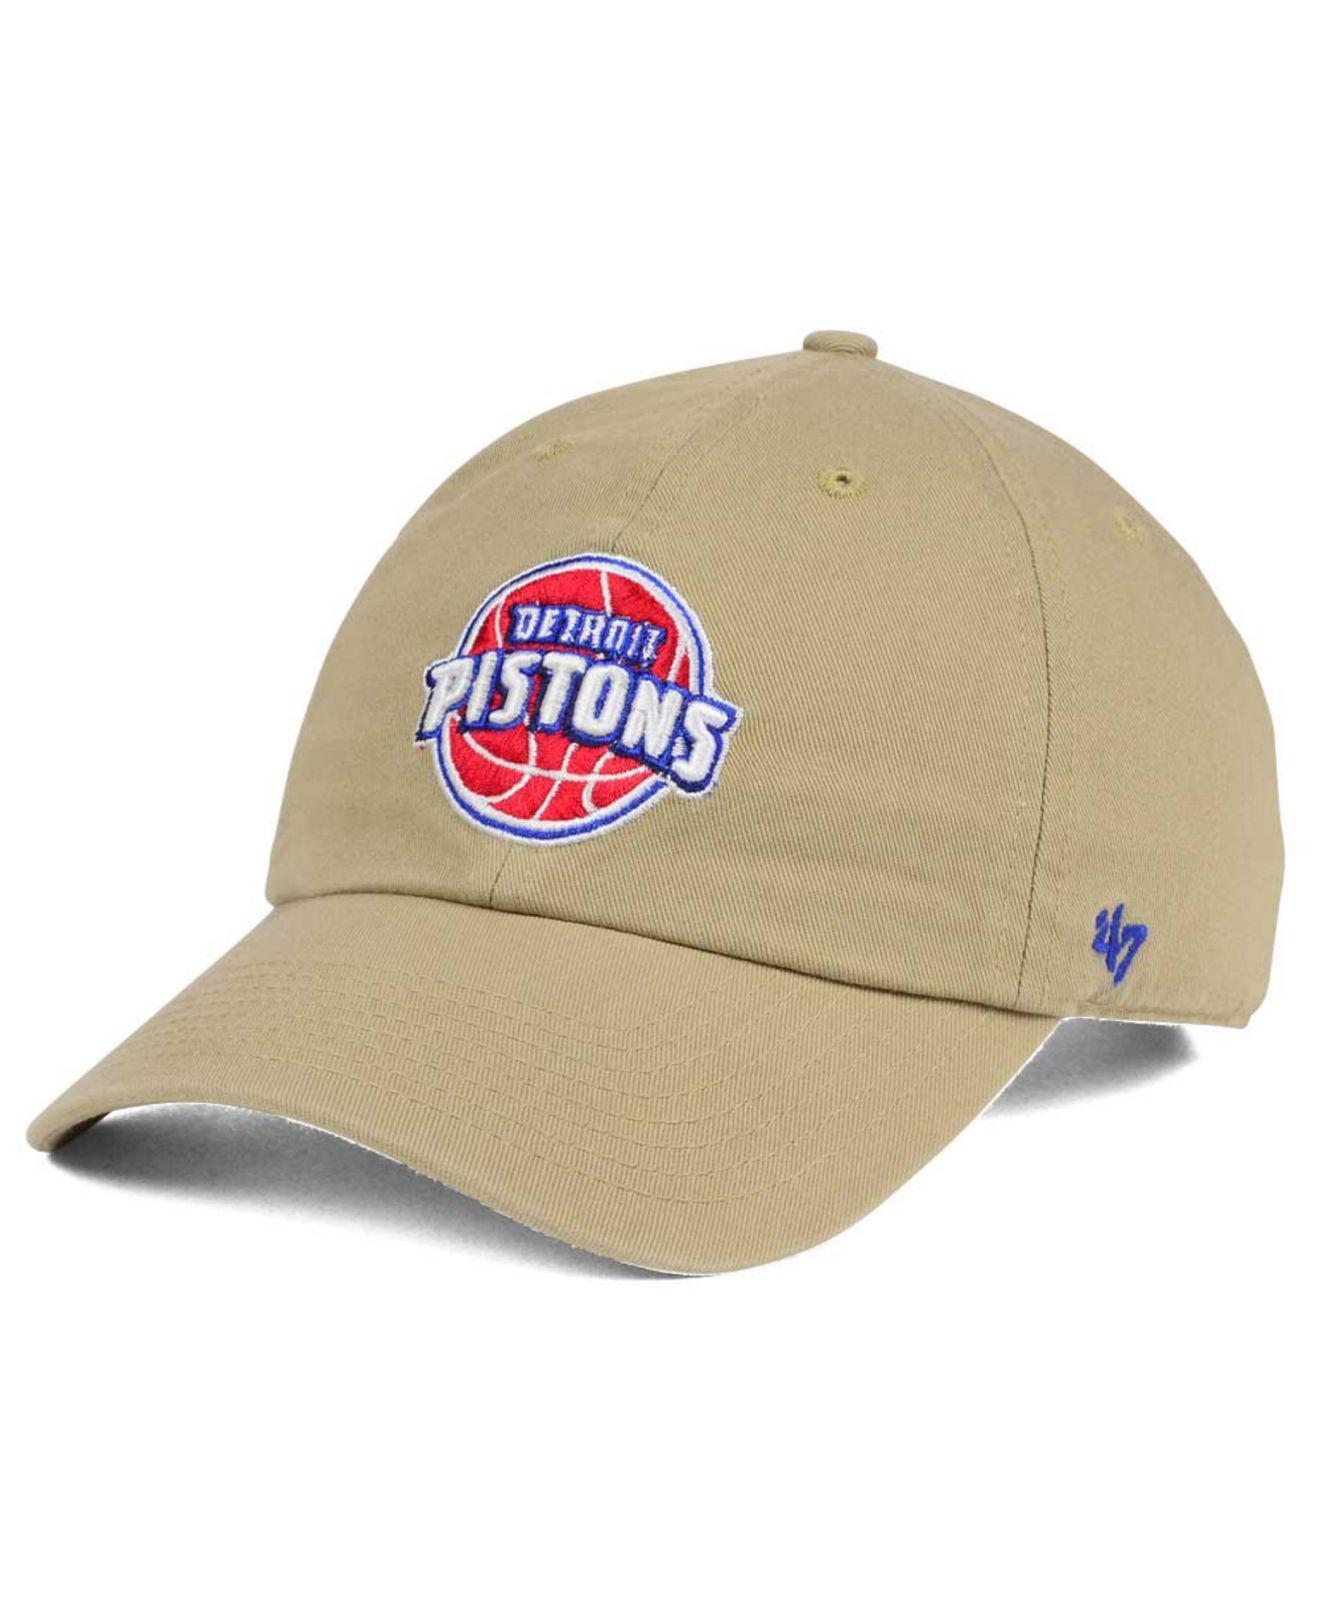 size 40 9b2f6 b7abf ... new style lyst 47 brand detroit pistons khaki clean up cap for men  cd056 25777